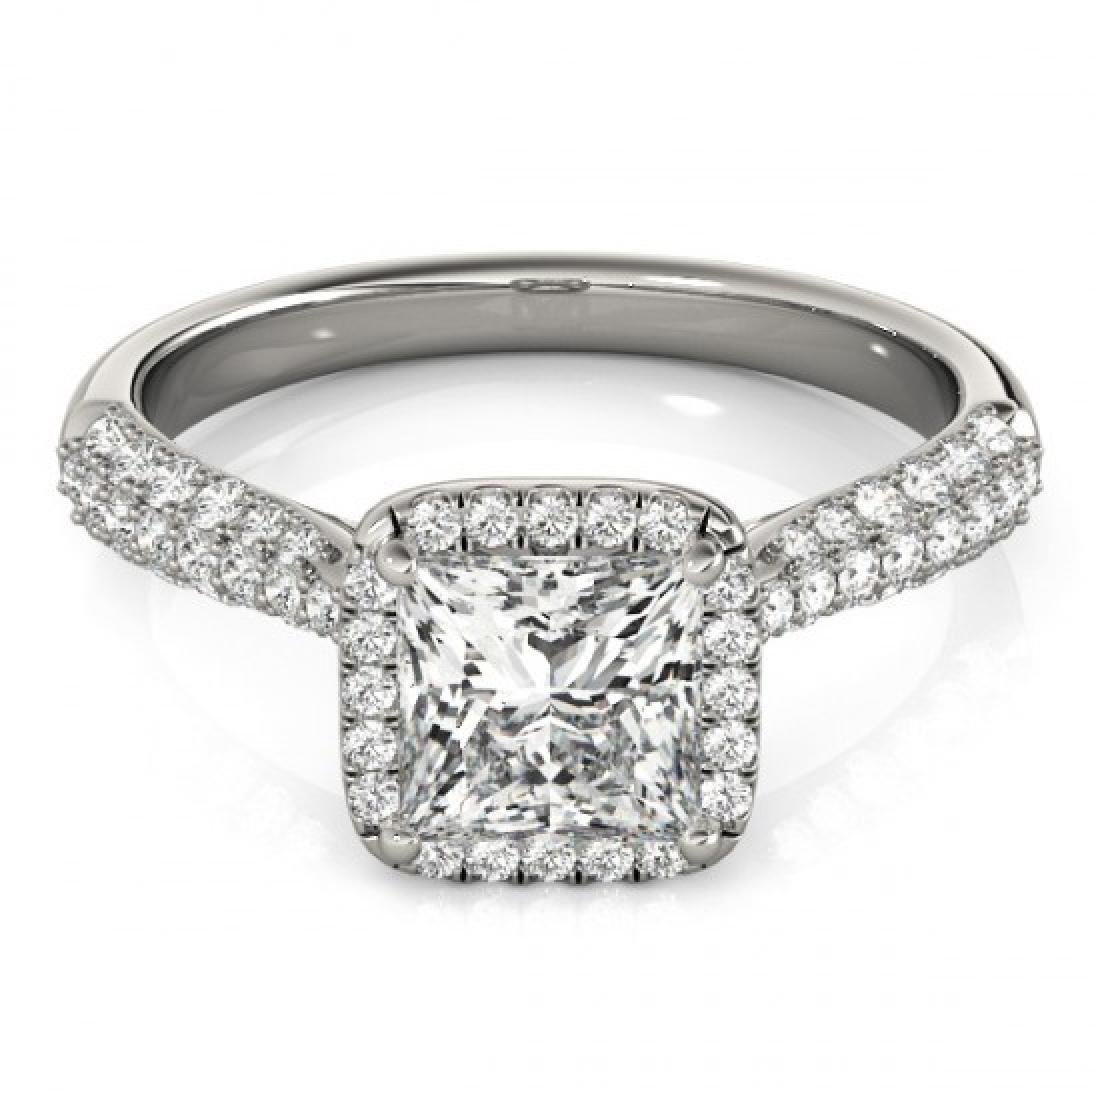 1.15 CTW Certified VS/SI Princess Diamond Solitaire